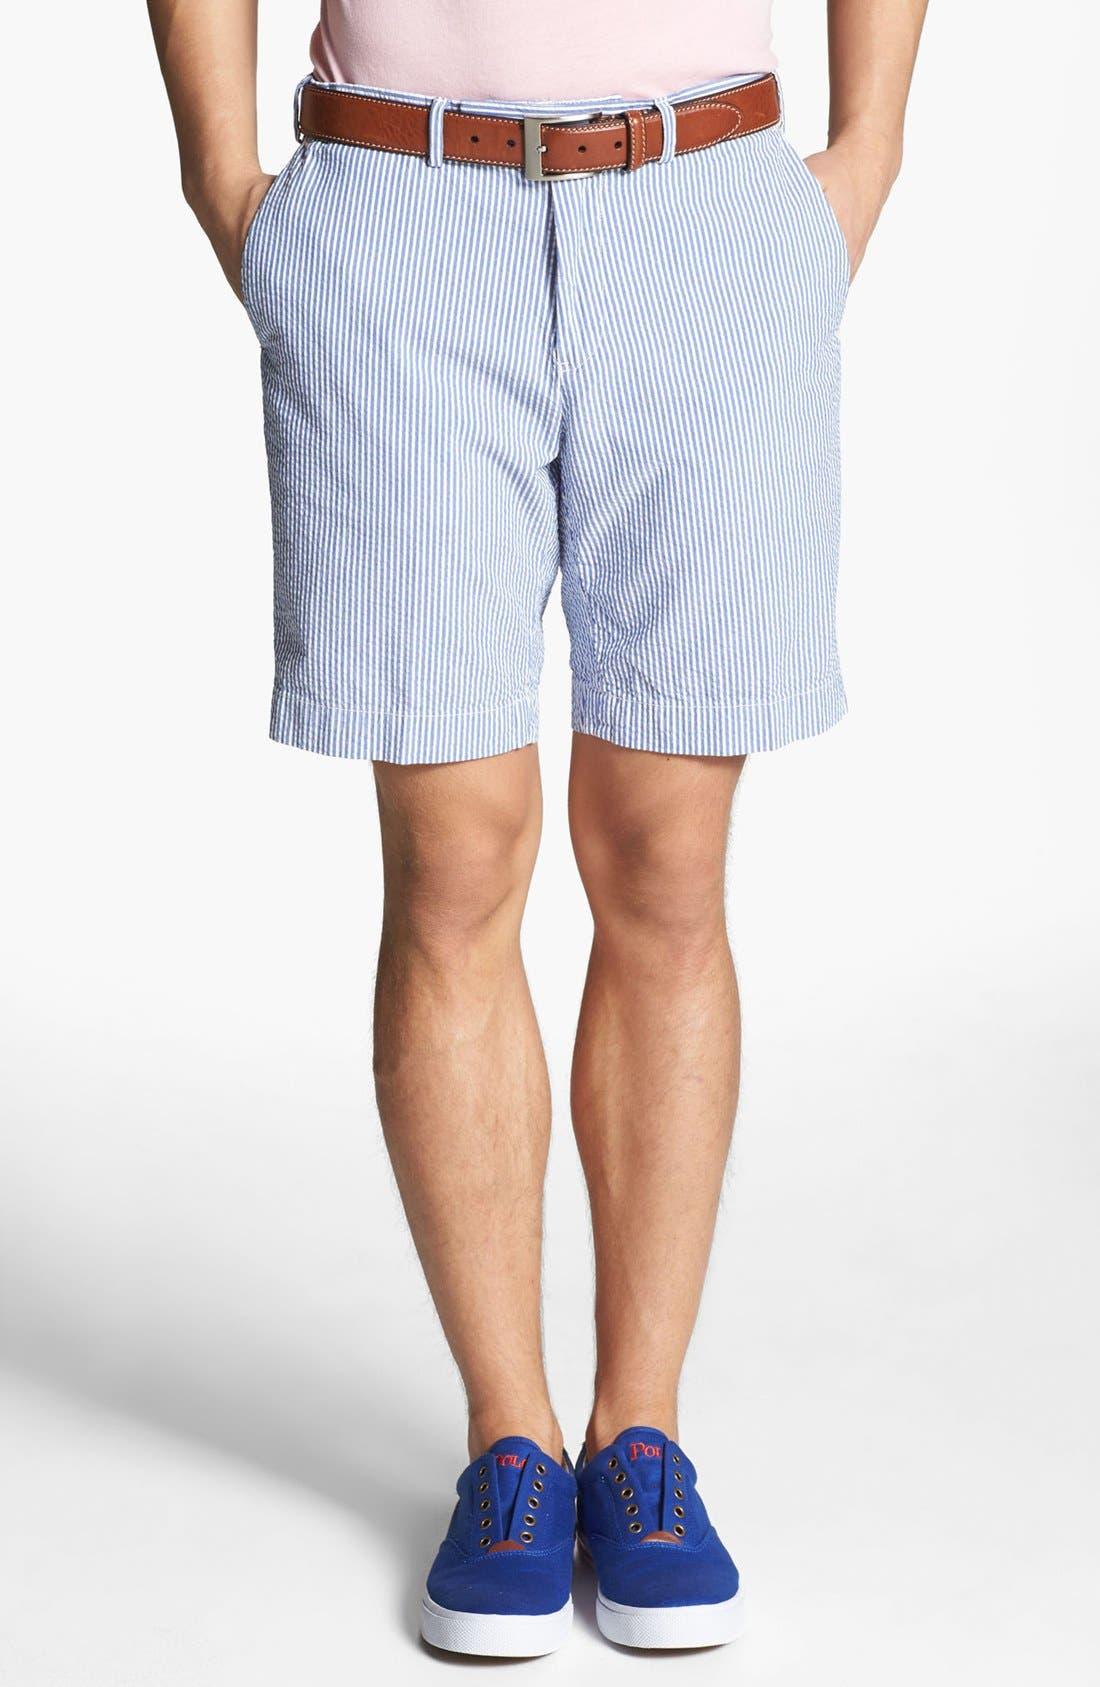 Main Image - Polo Ralph Lauren 'Suffield' Shorts